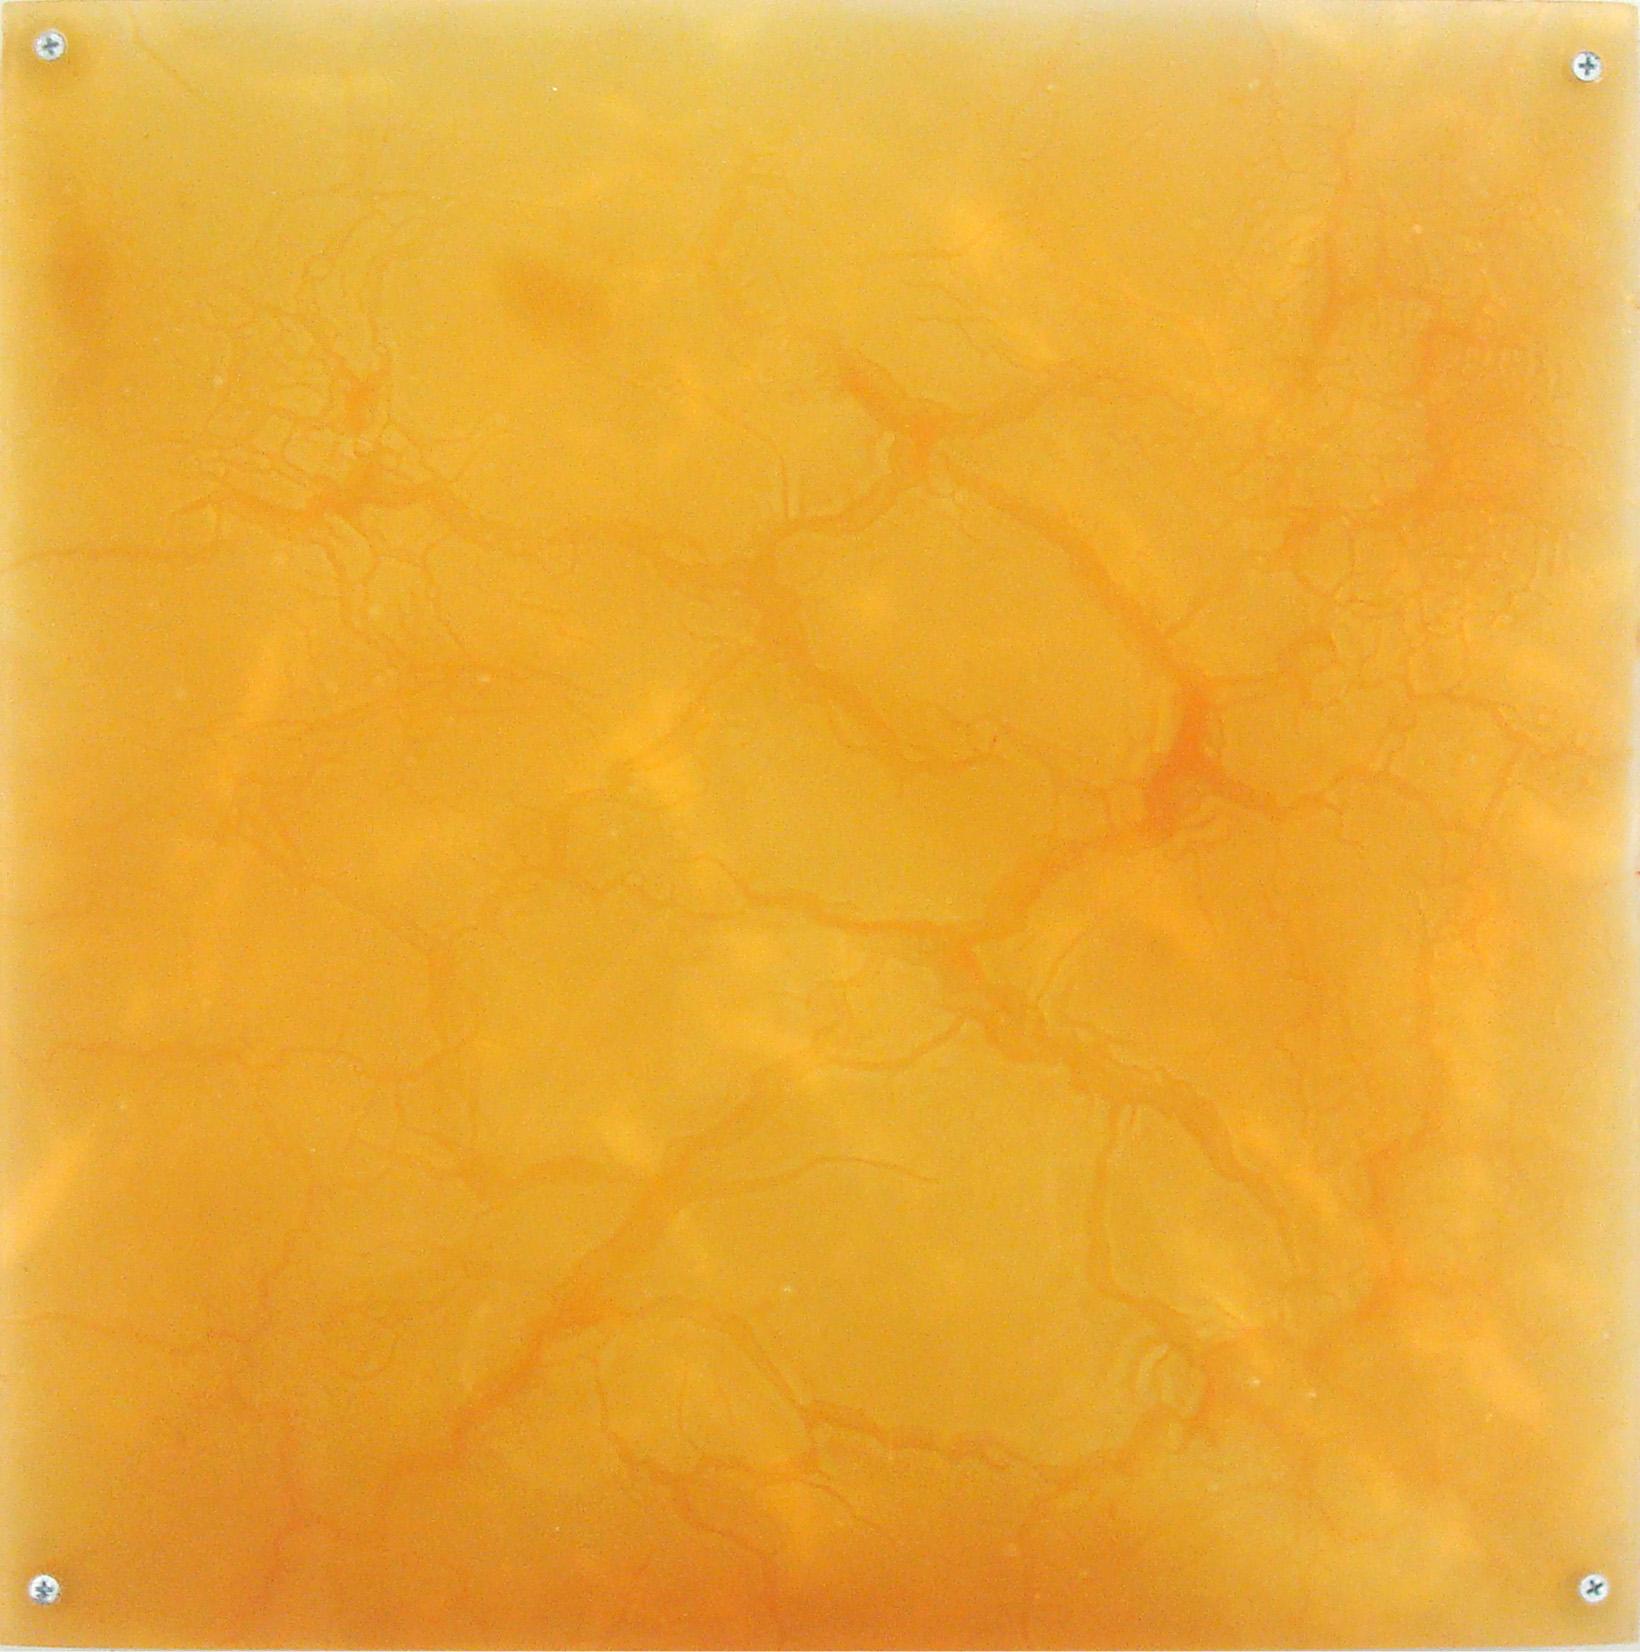 Untitled, 1994, mixed media on wood, 30 x 30 cm.